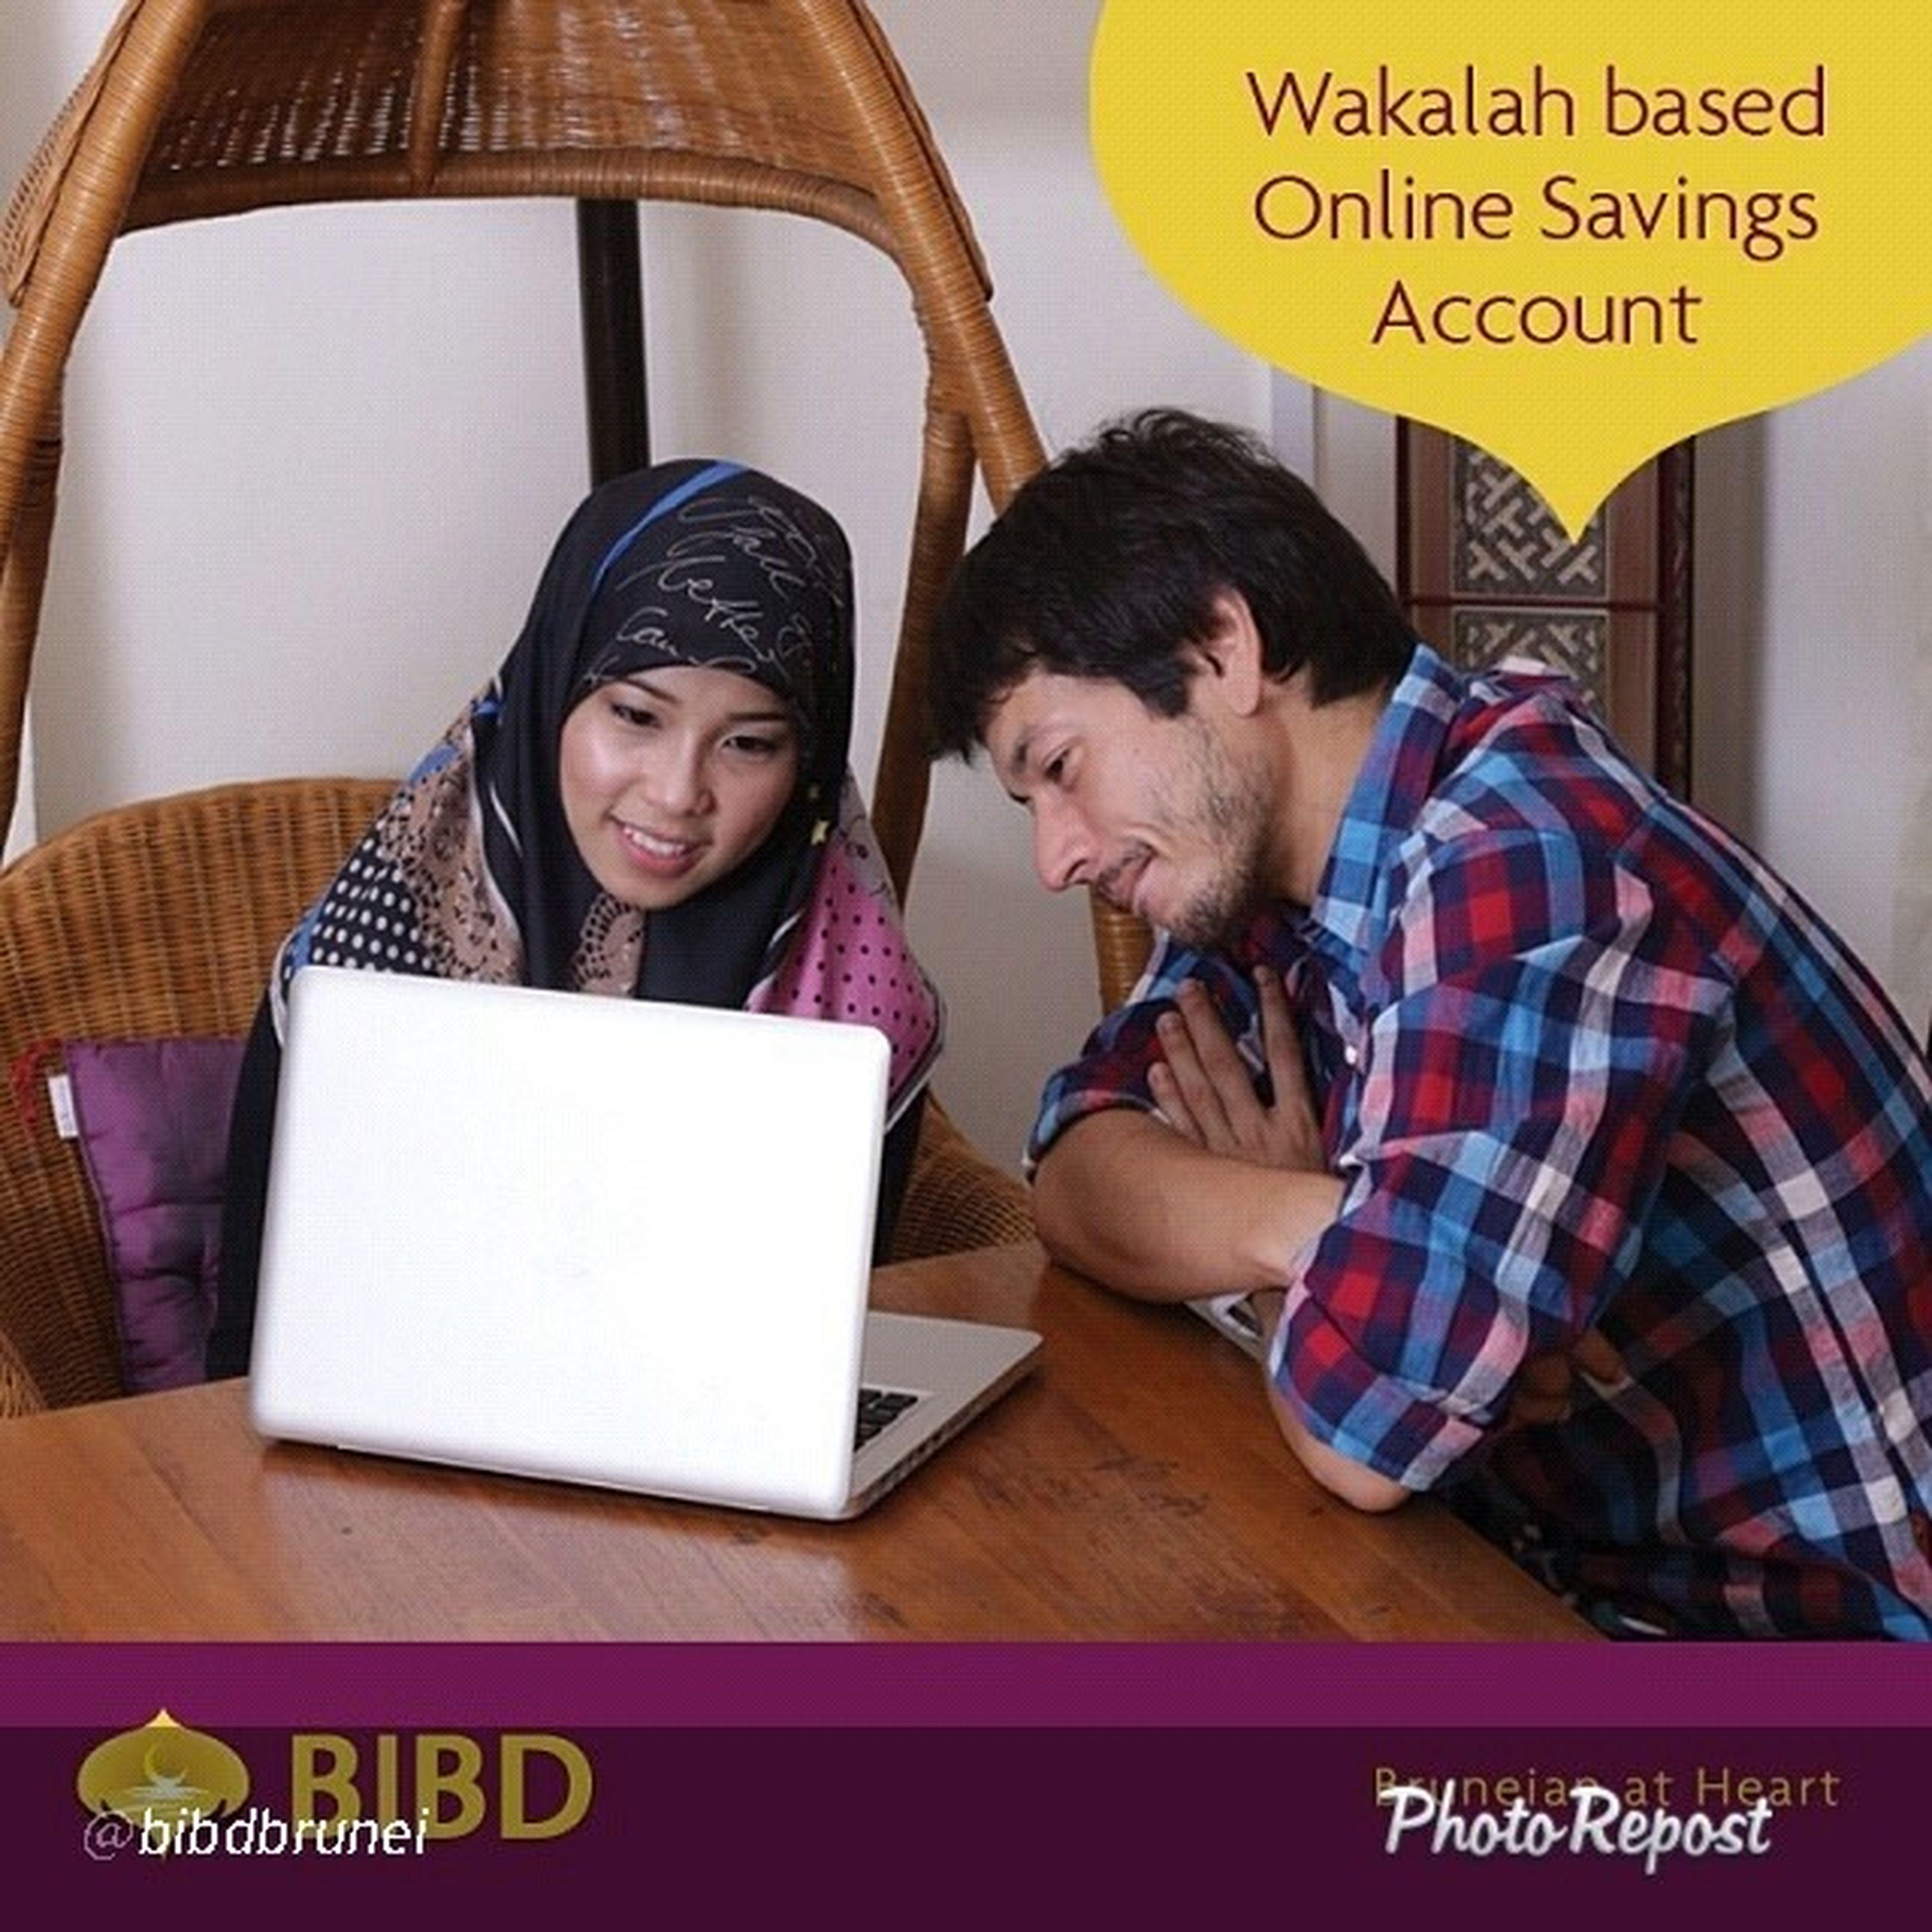 "By @bibdbrunei ""Dari 1 Disember 2013 hingga 31 Mac 2014, dapatkan 1,000 Hadiah Points apabila awda membuka Akaun Easy Saver atau Purpose Saver secara online melalui BIBD Online. Untuk keterangan lanjut sila kunjungi cawangan kami yang terdekat atau hubungi 223818. Bibd Bibdwakalah Brunei Bibdonline "" via @PhotoRepost_app"